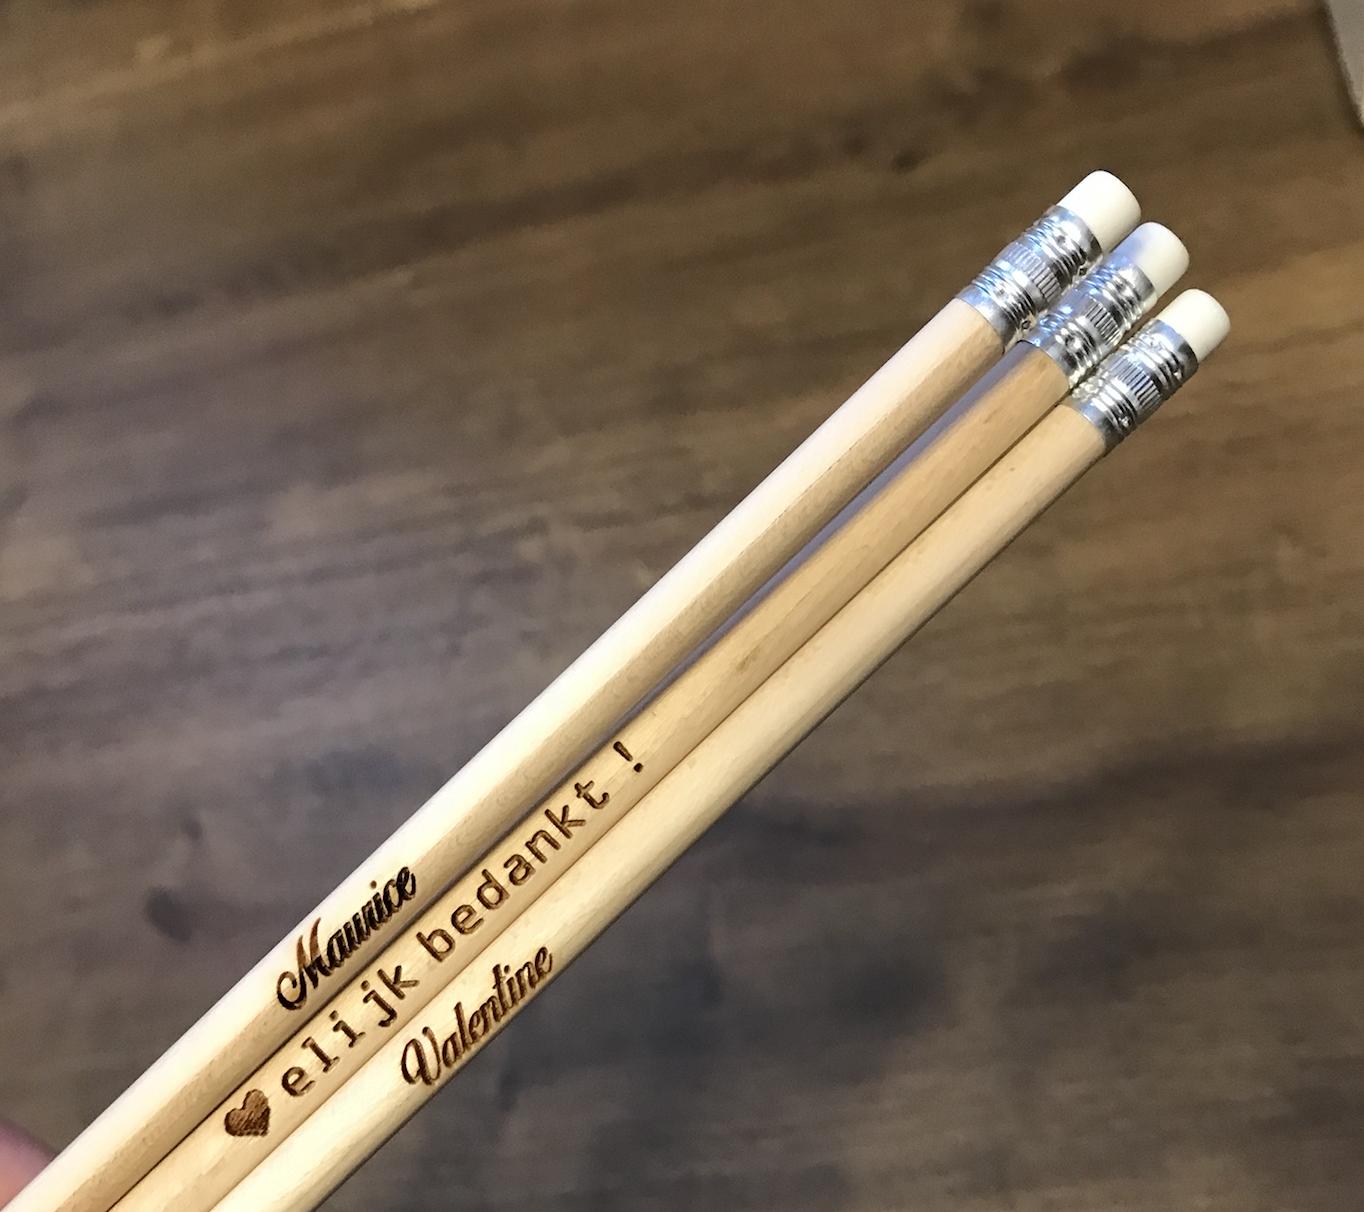 Houten potloden als bedanking